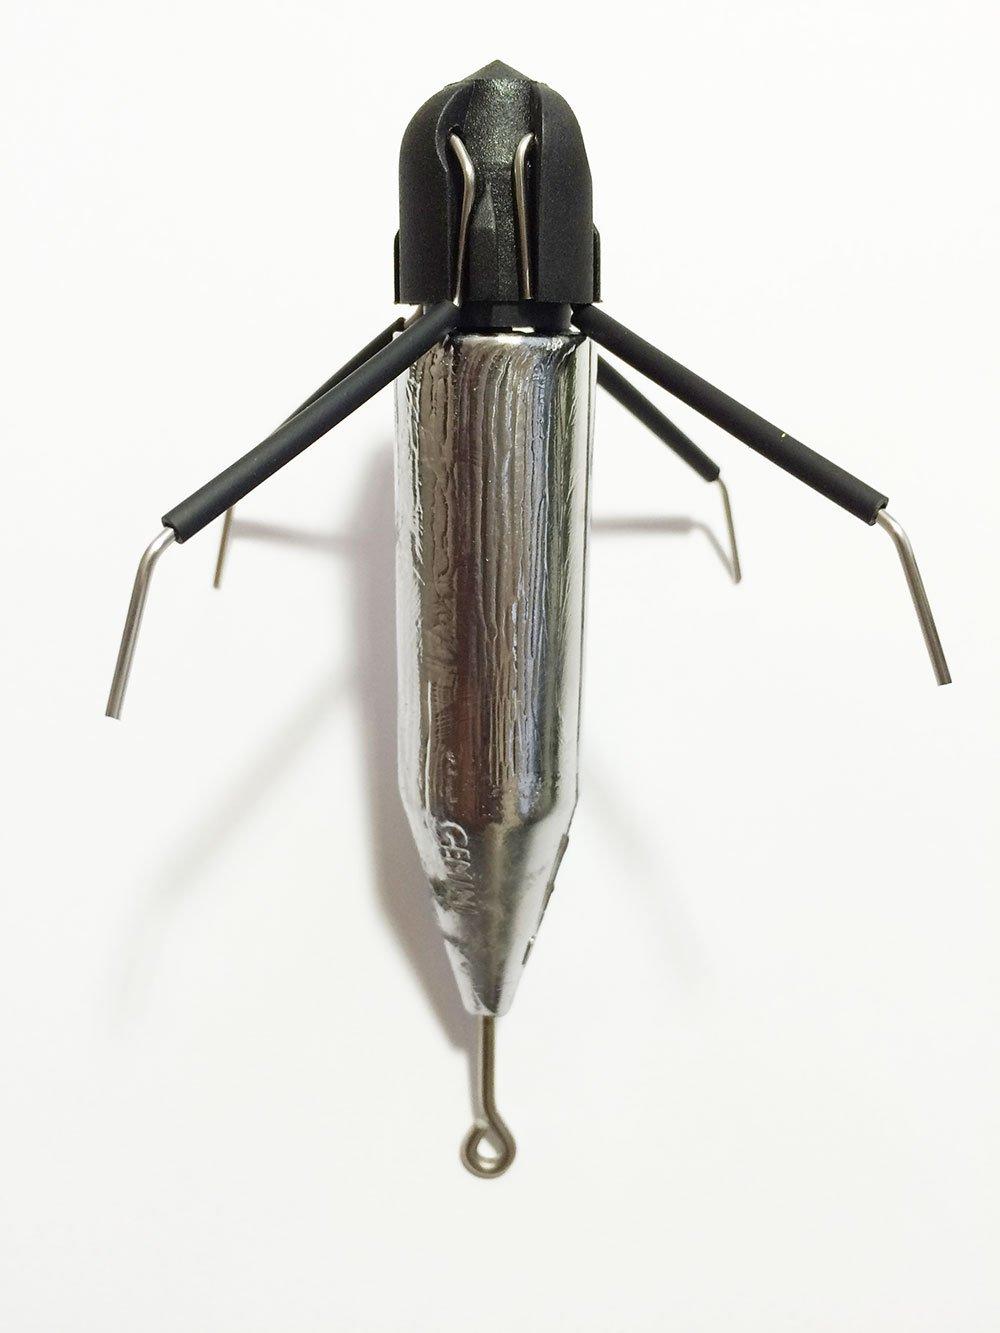 5 pcs Gemini Breakout Sinkers 6 oz Surf Sputnik Sinker Spider Weights